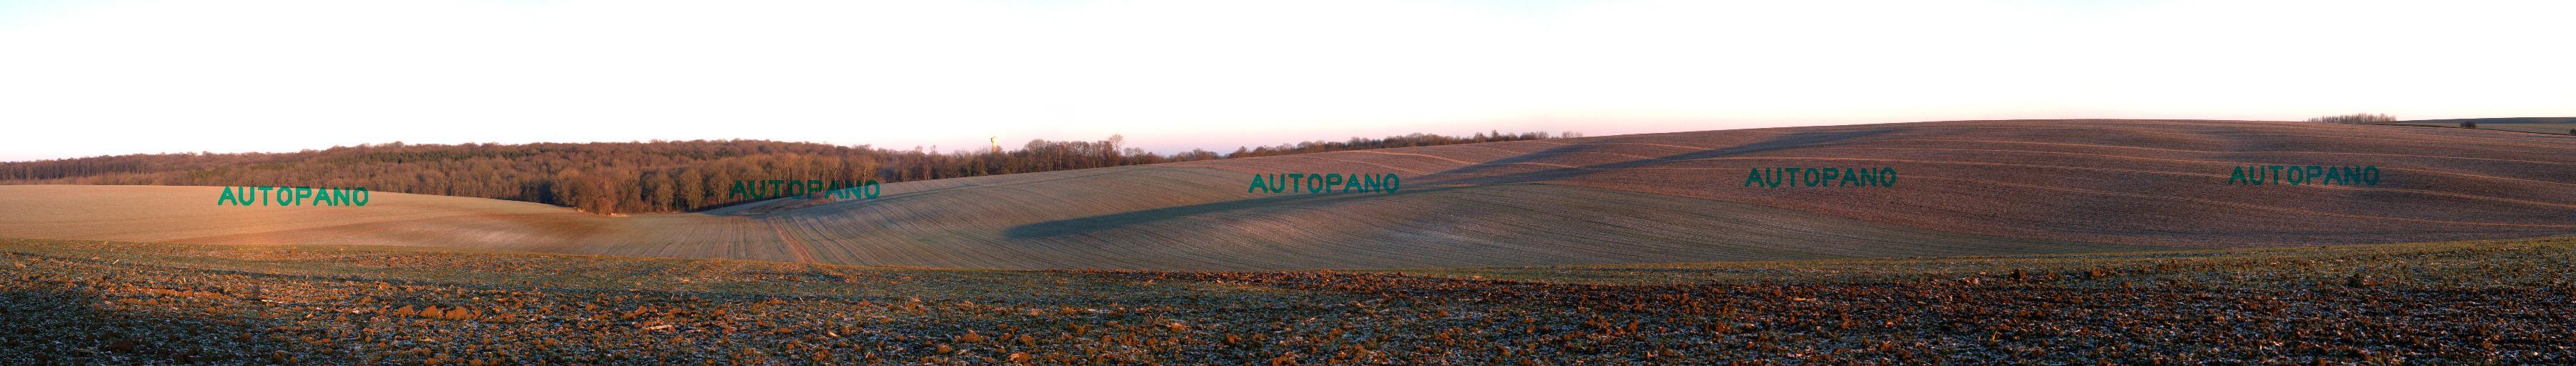 Panorama housset web2